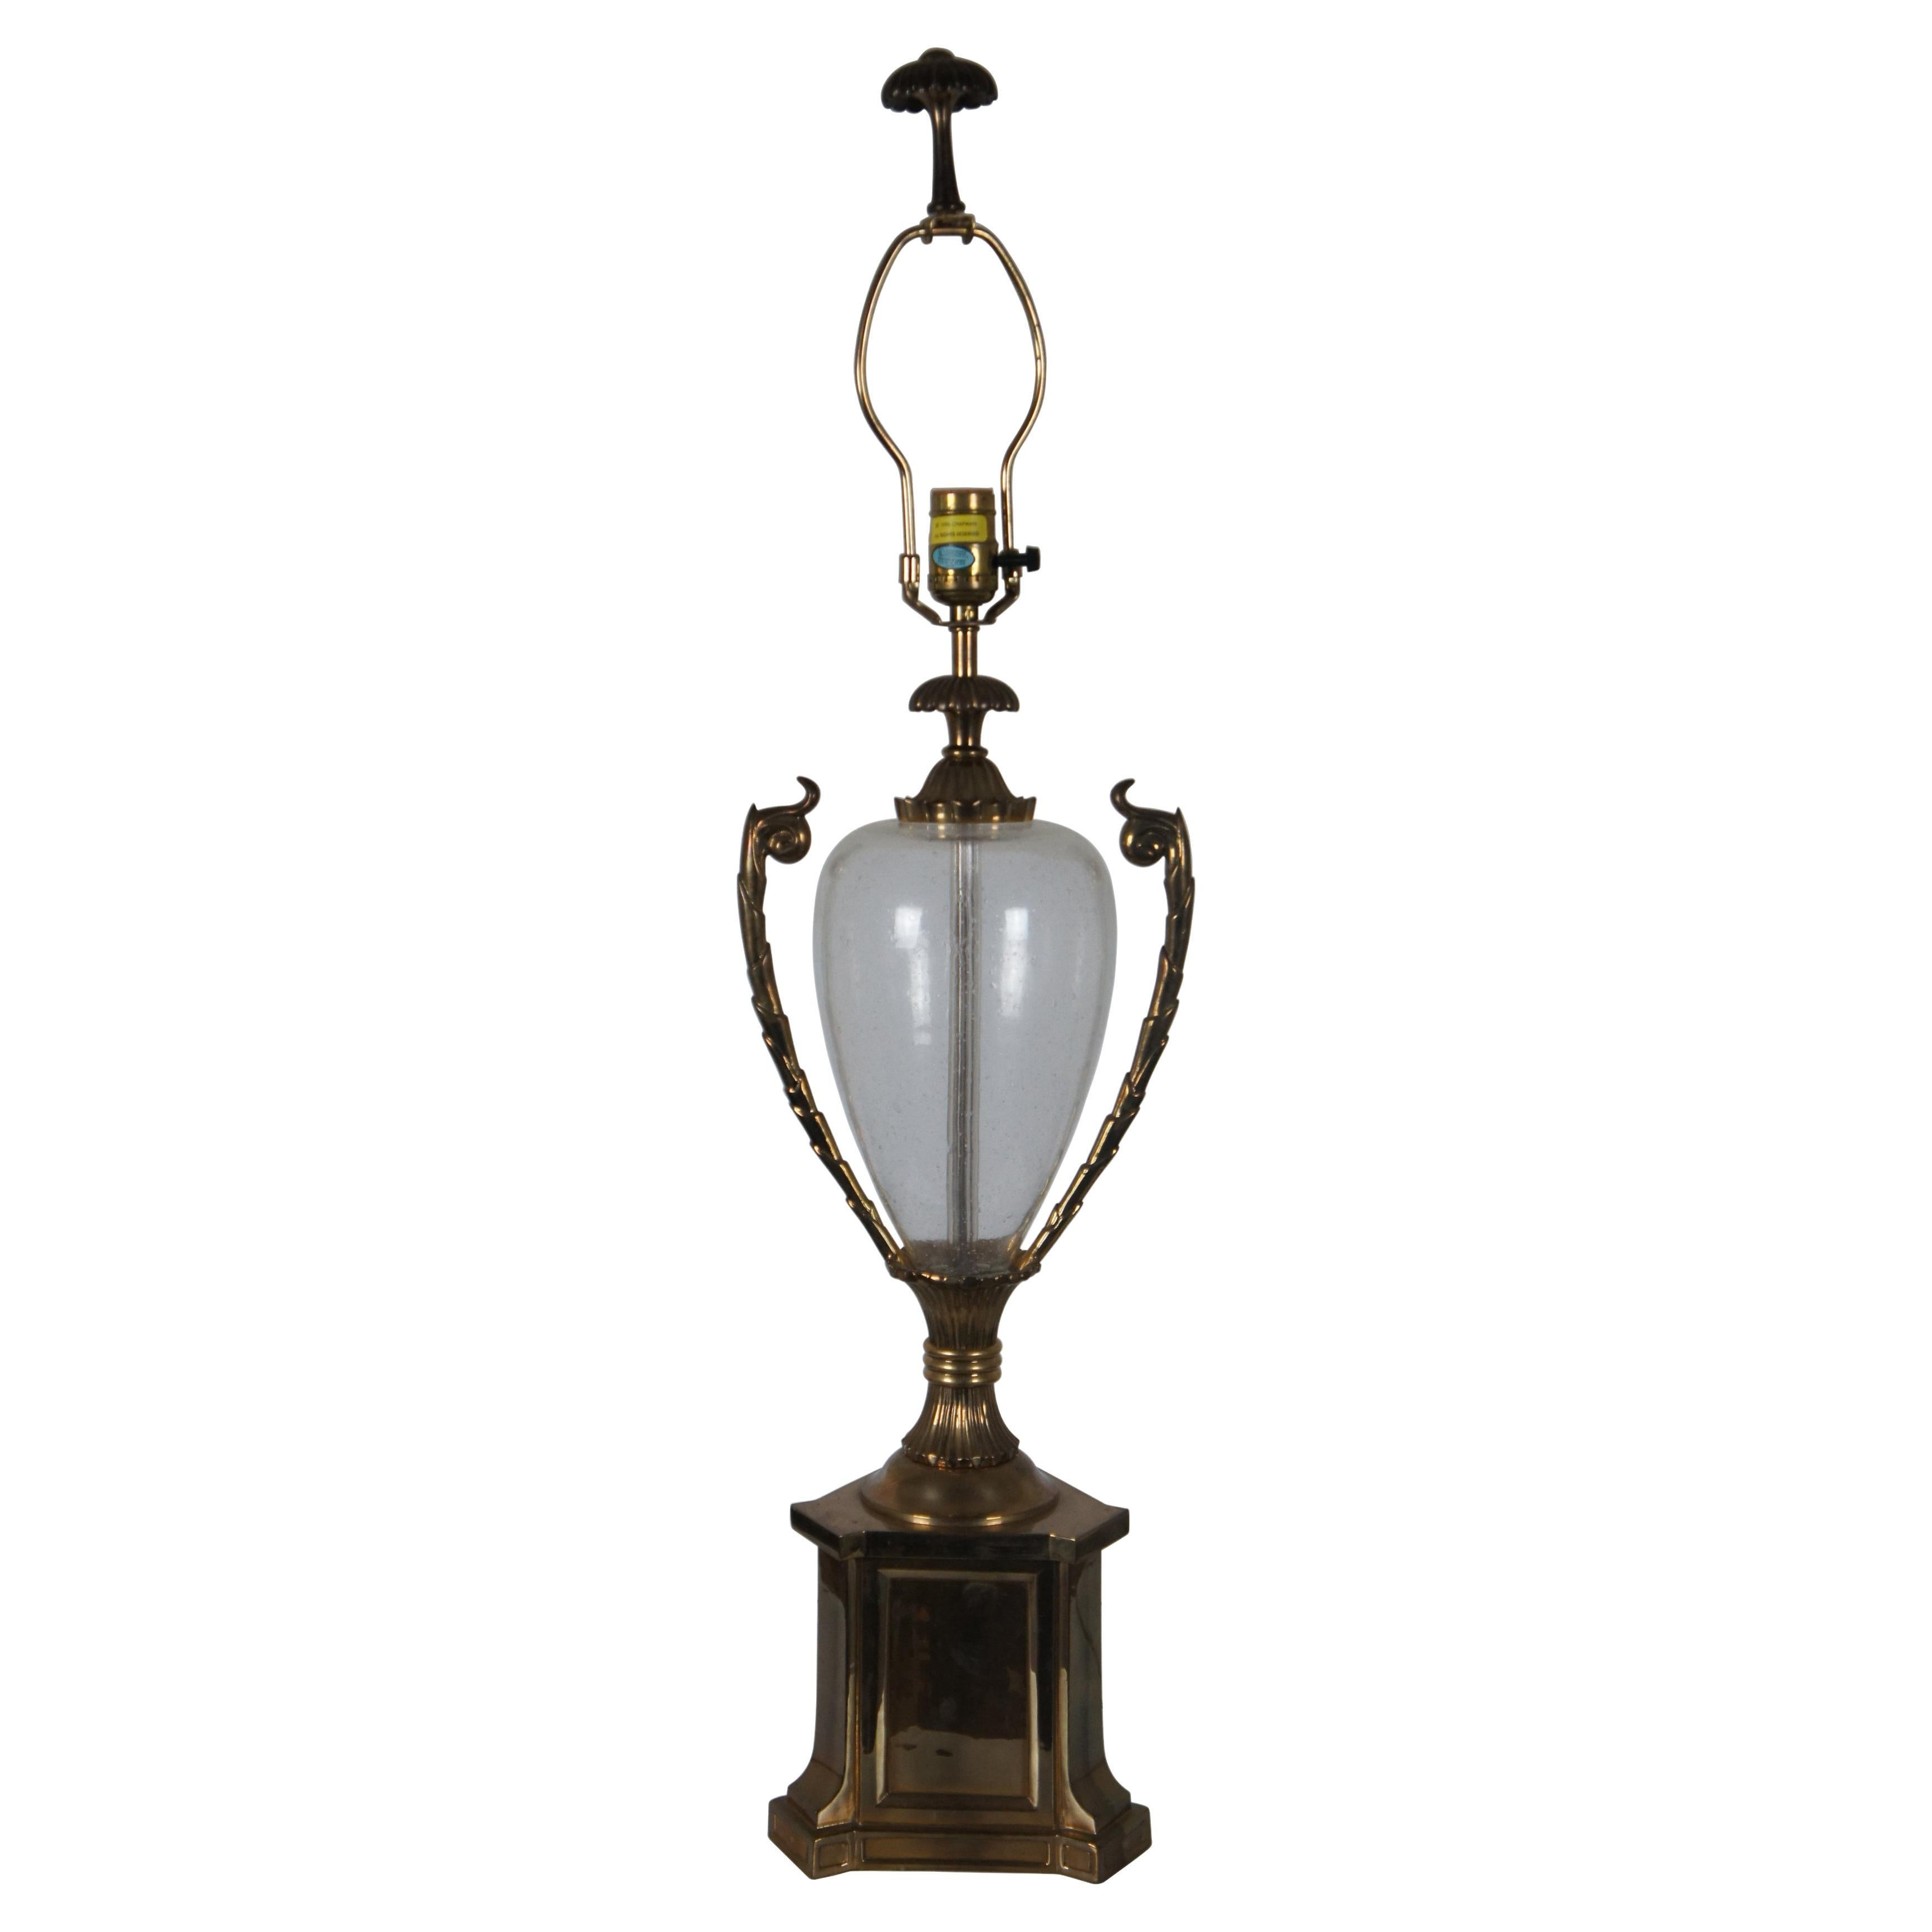 1990 Chapman Hollywood Regency Brass & Glass Globe Trophy Urn Table Lamp